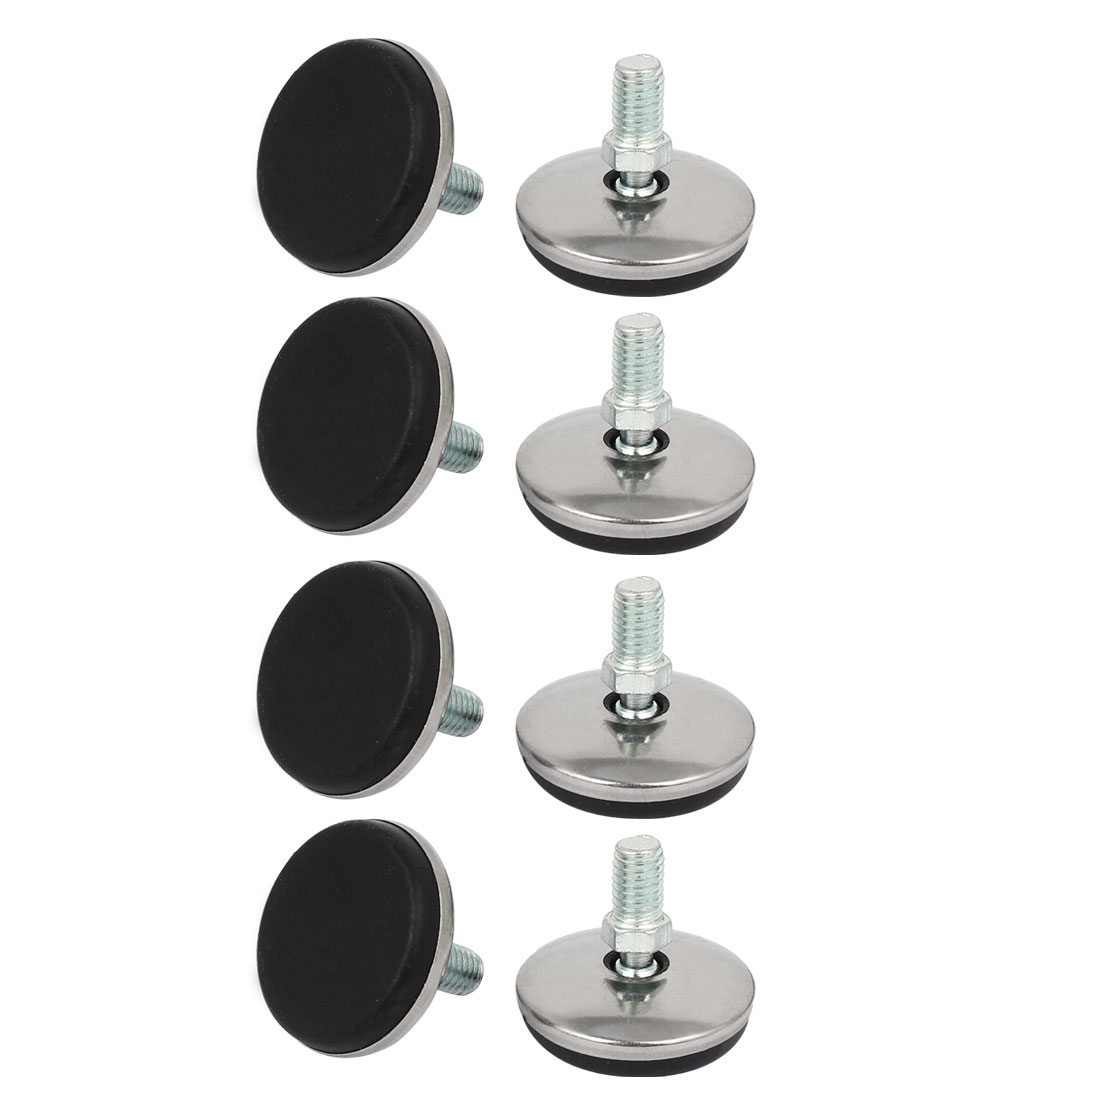 37mm Dia Plastic Base Thread Stem Adjustable Leveling Foot Furniture Glide 8pcs